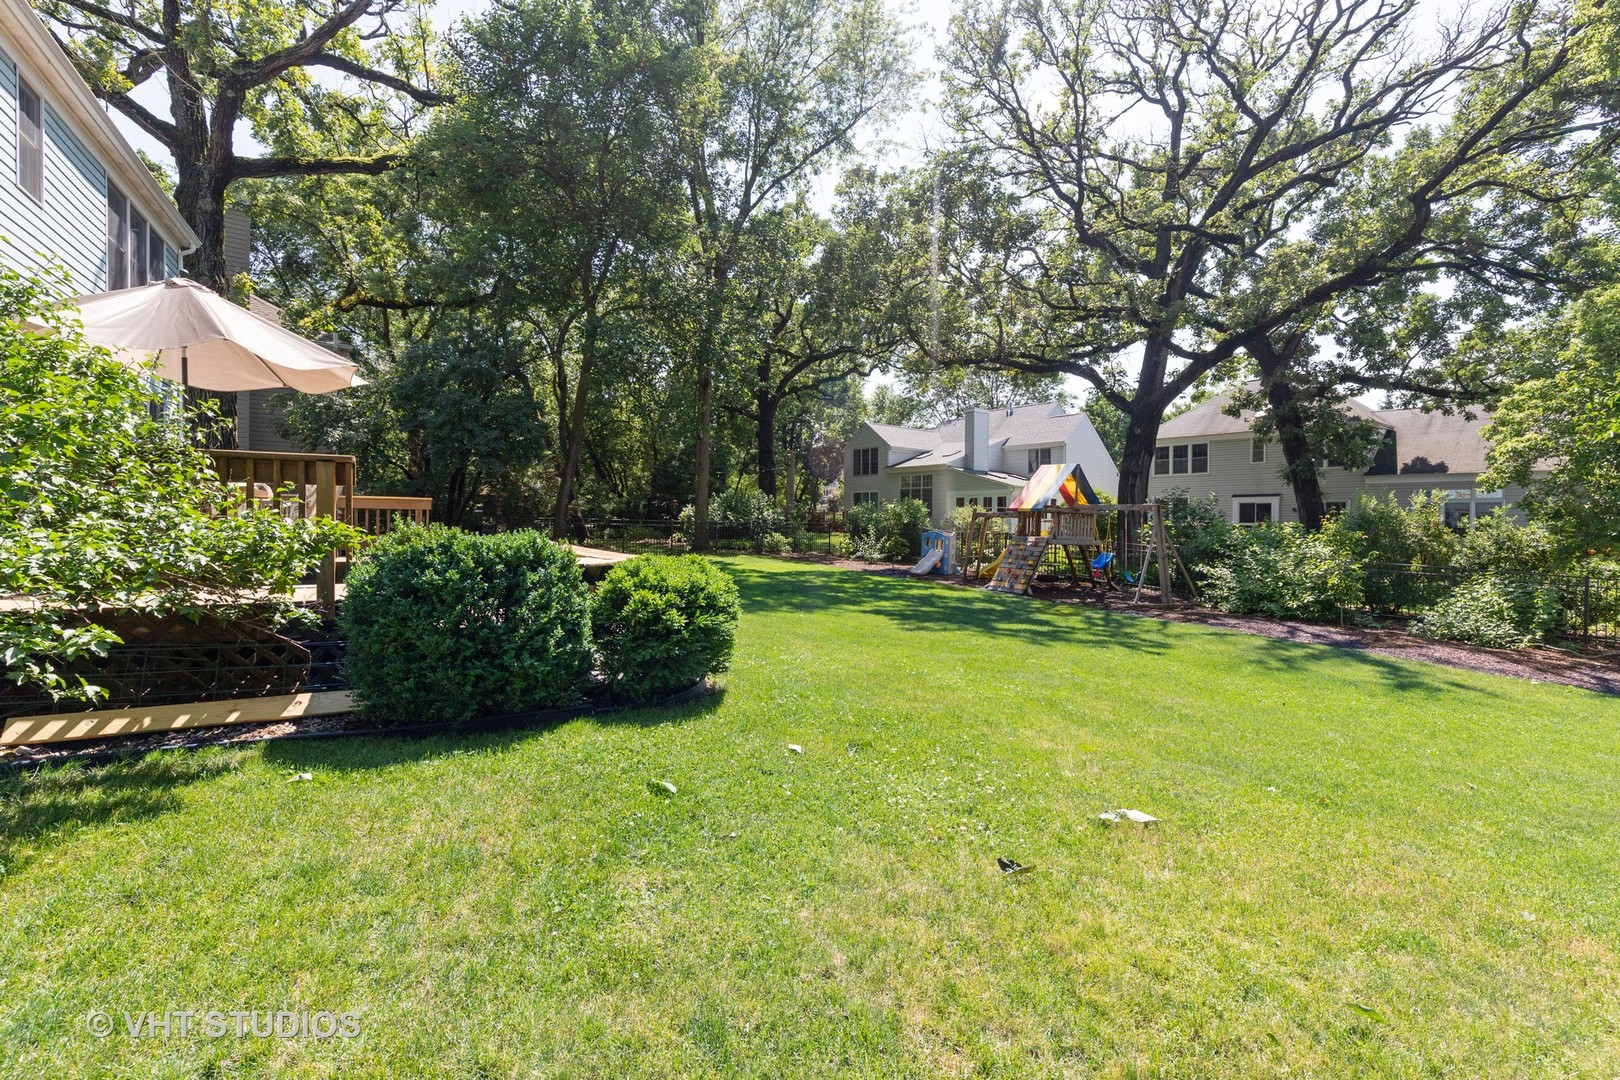 1128 Chesapeake, Grayslake, Illinois, 60030